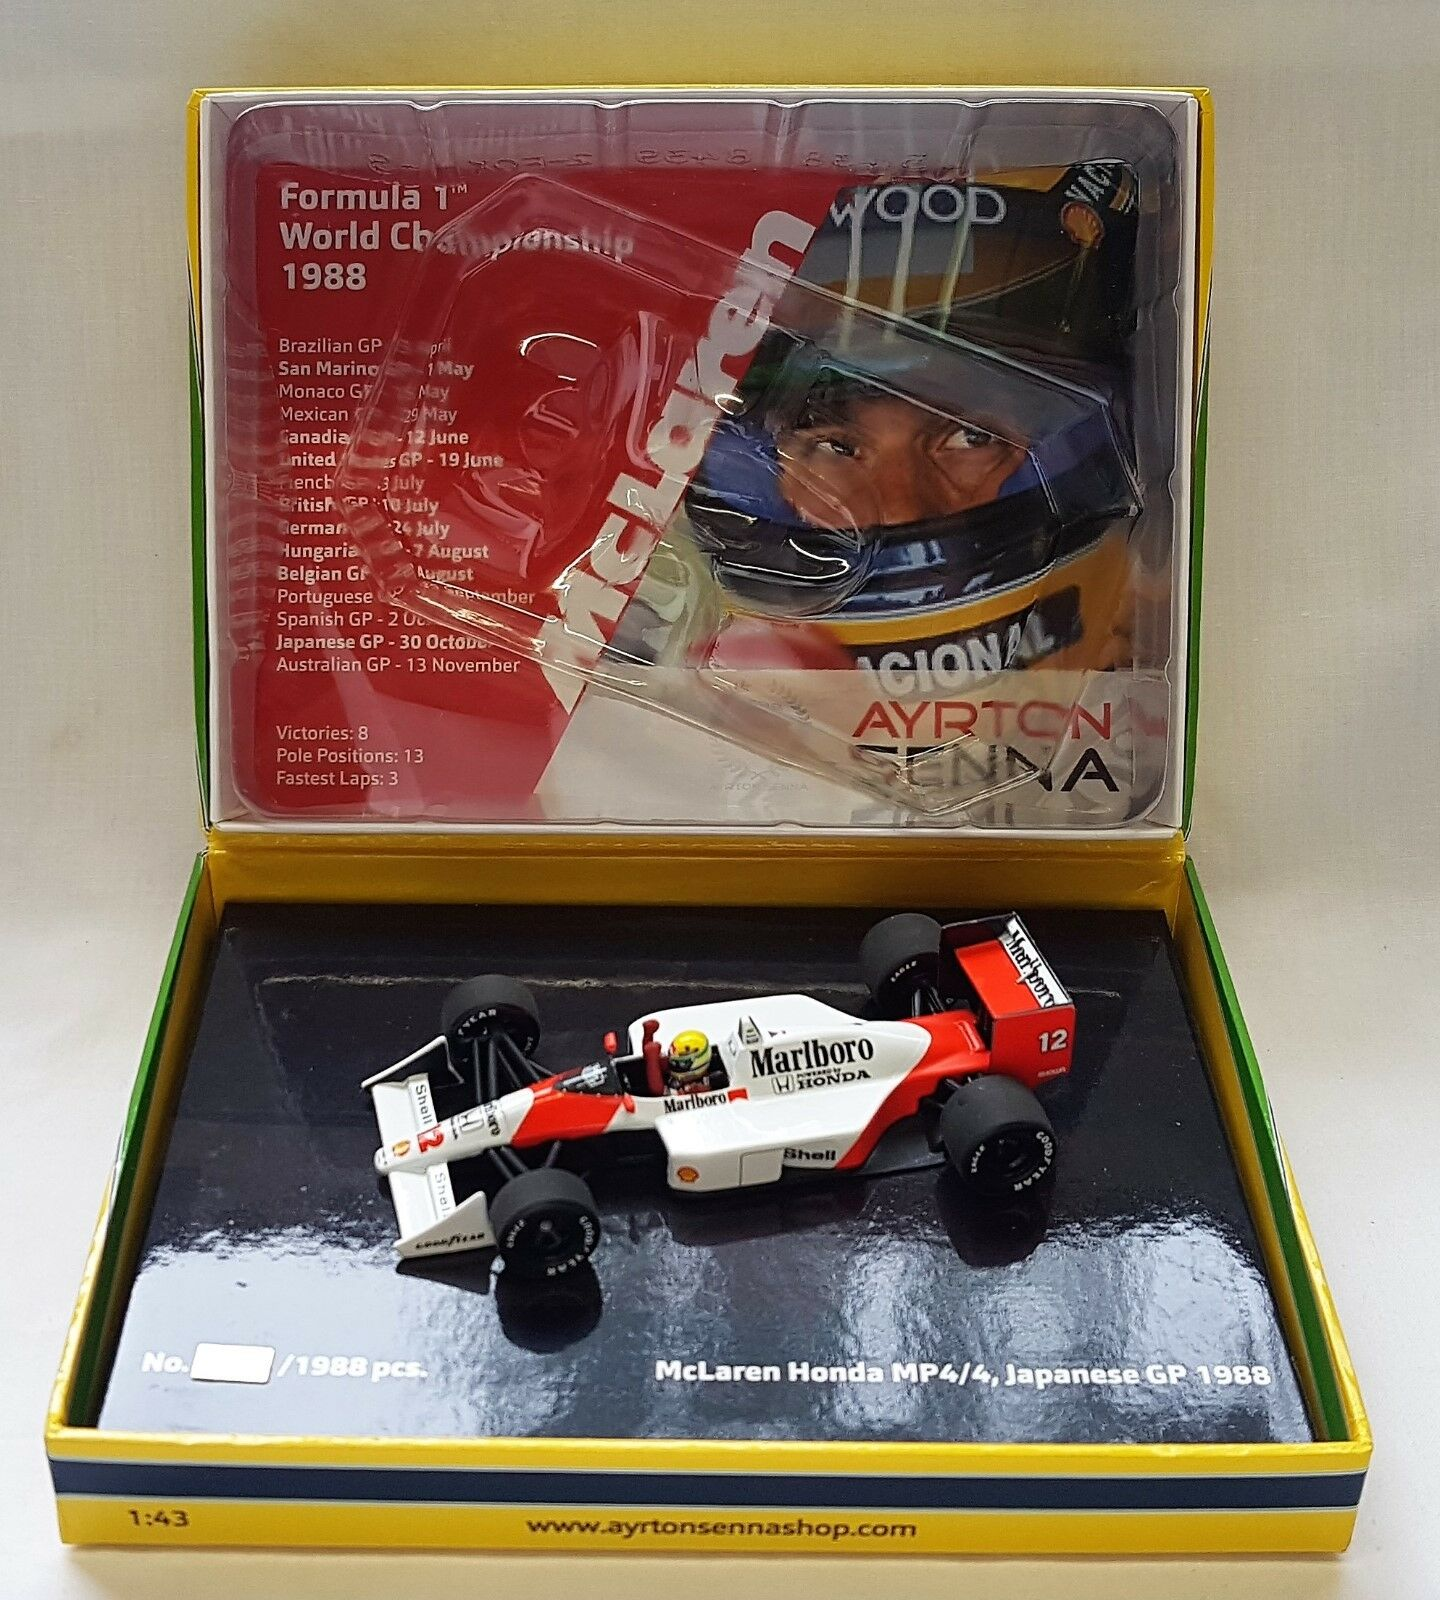 Minichamps 543884392 - McLaren Honda MP 4/4 Ayrton Senna 1988 Japanese GP